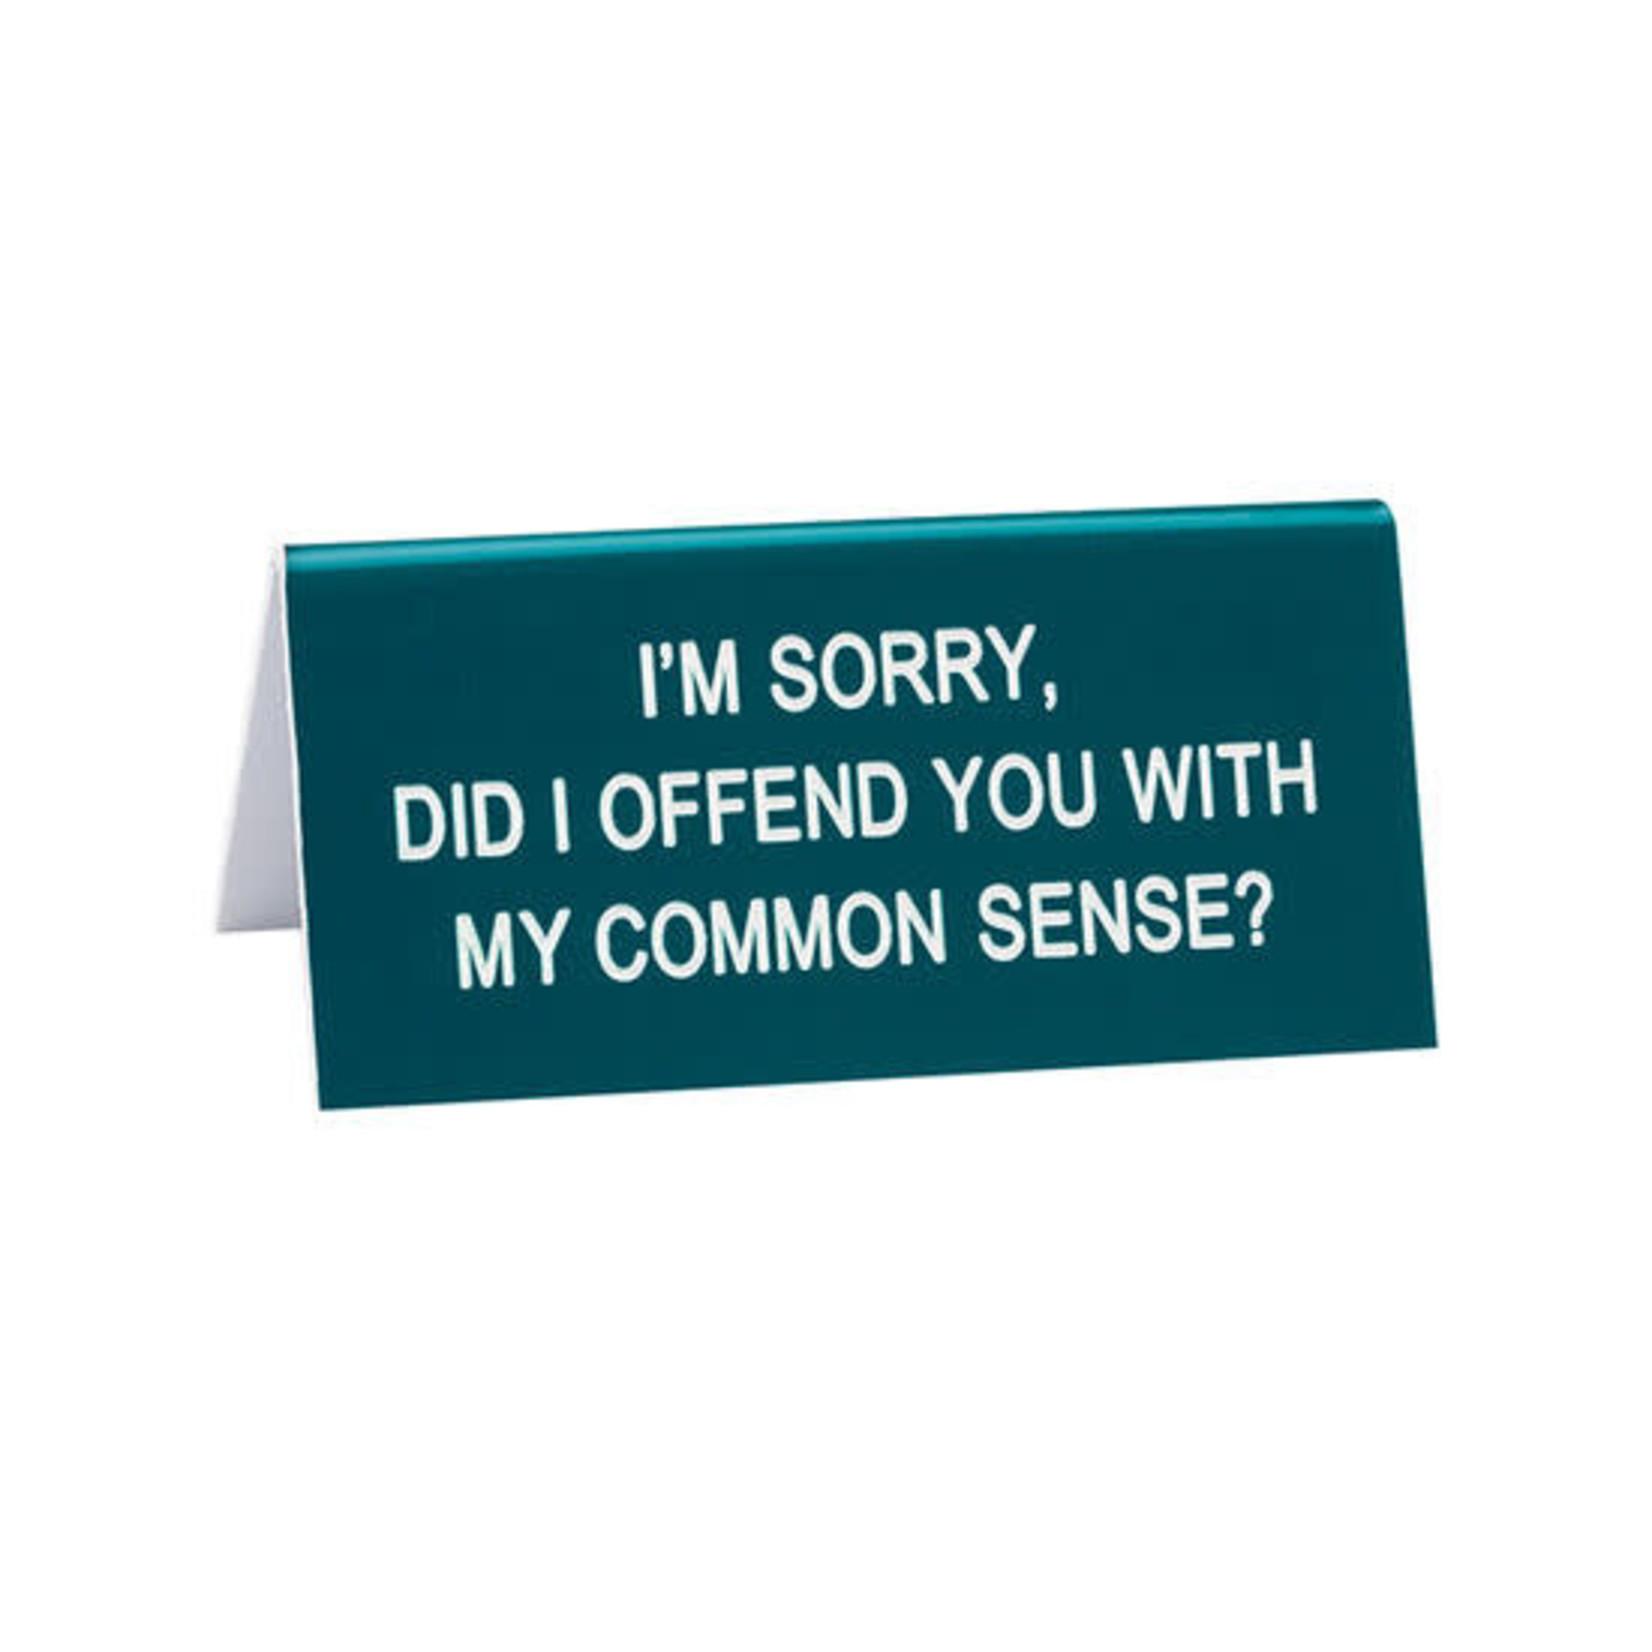 About Face Designs, Inc Snarky: Common Sense Desk Sign